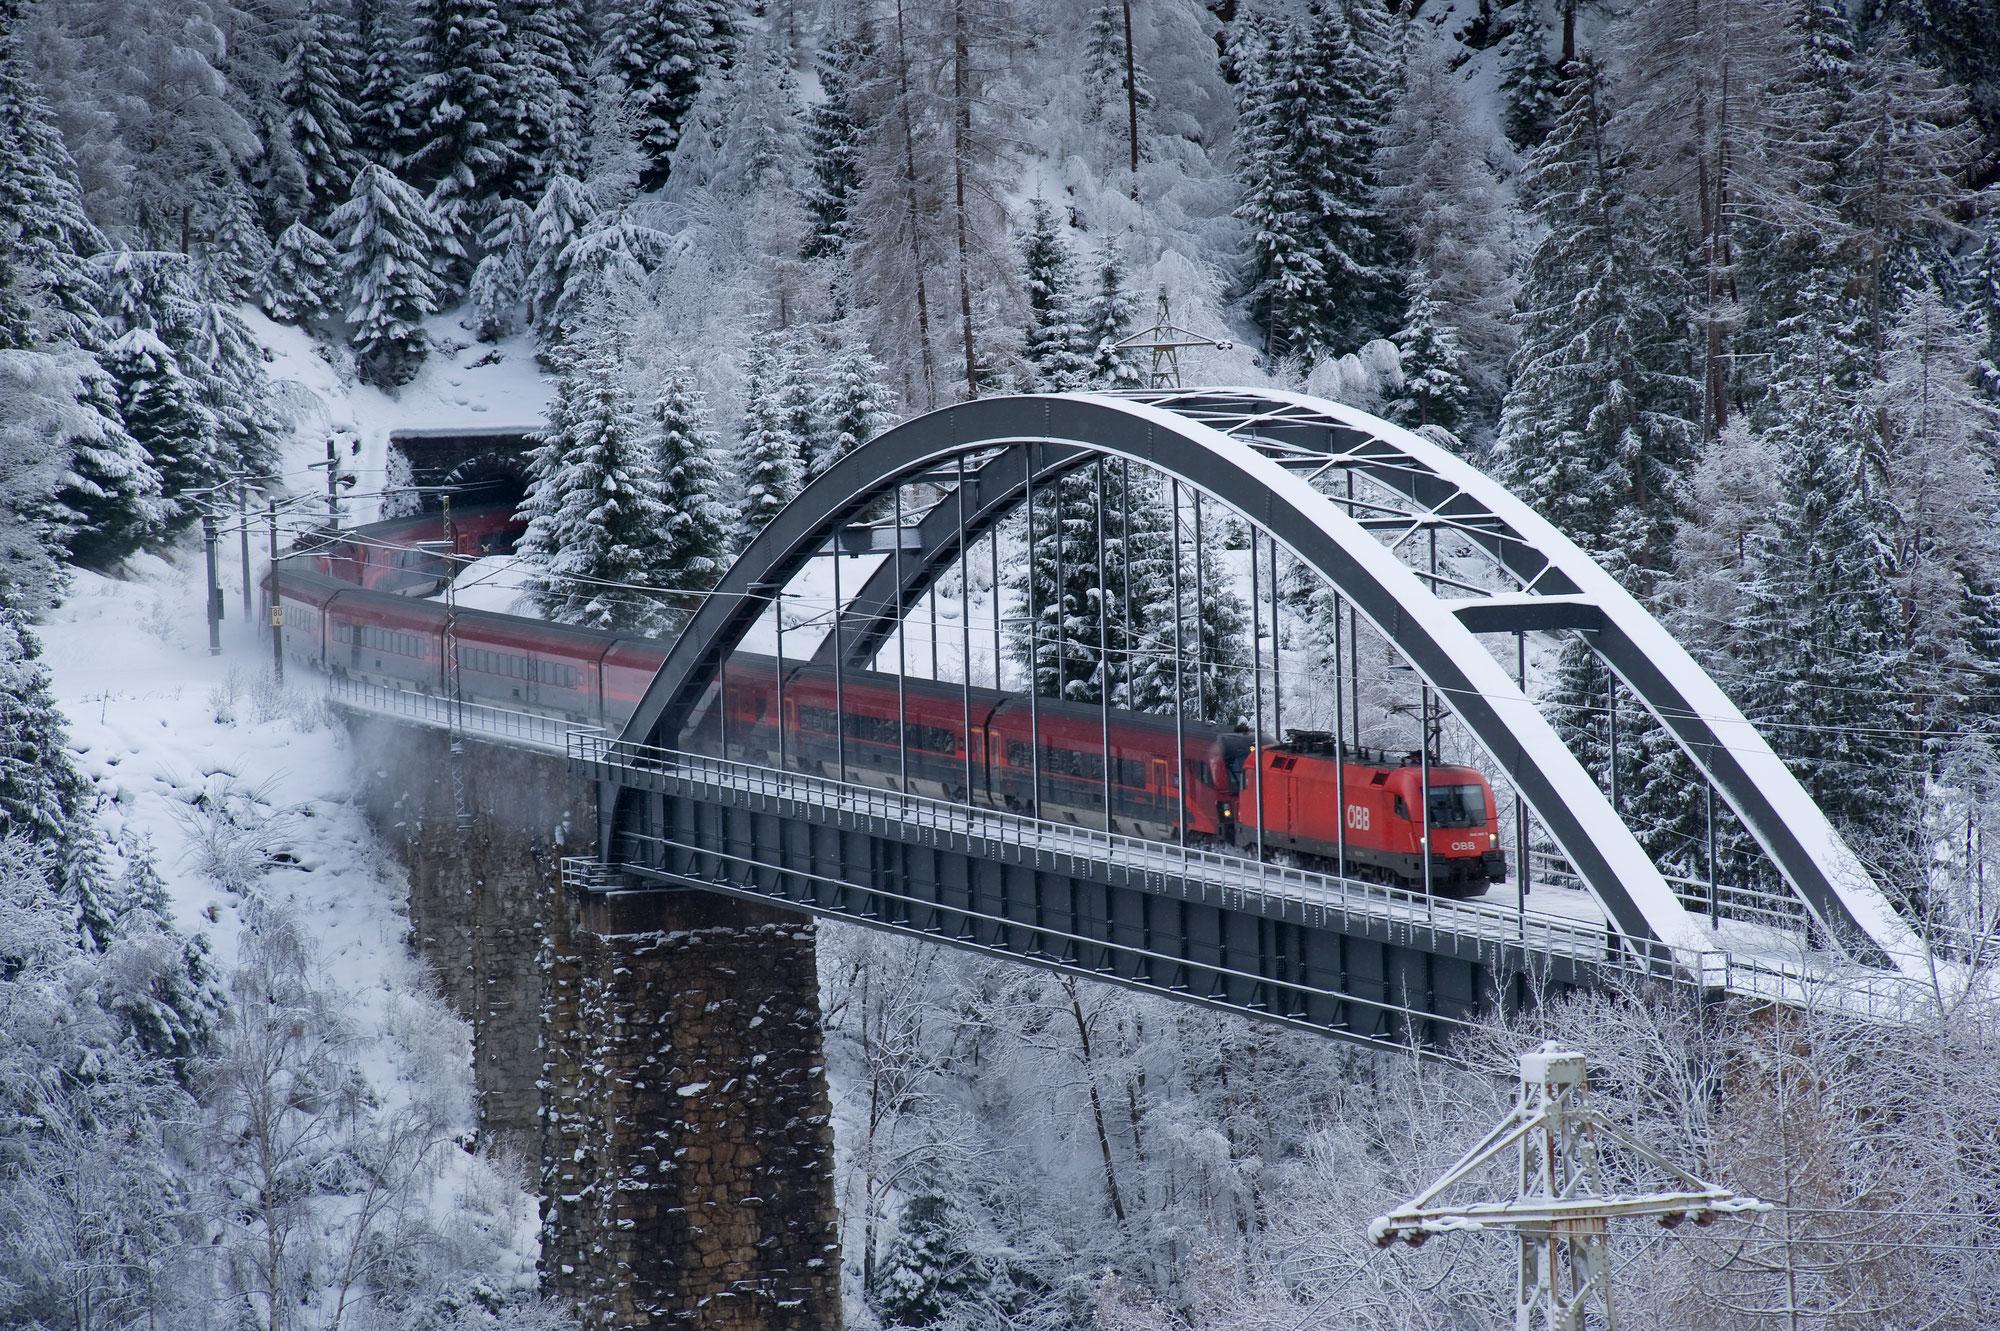 Aufbau eines Arlbergbahn-Archivs